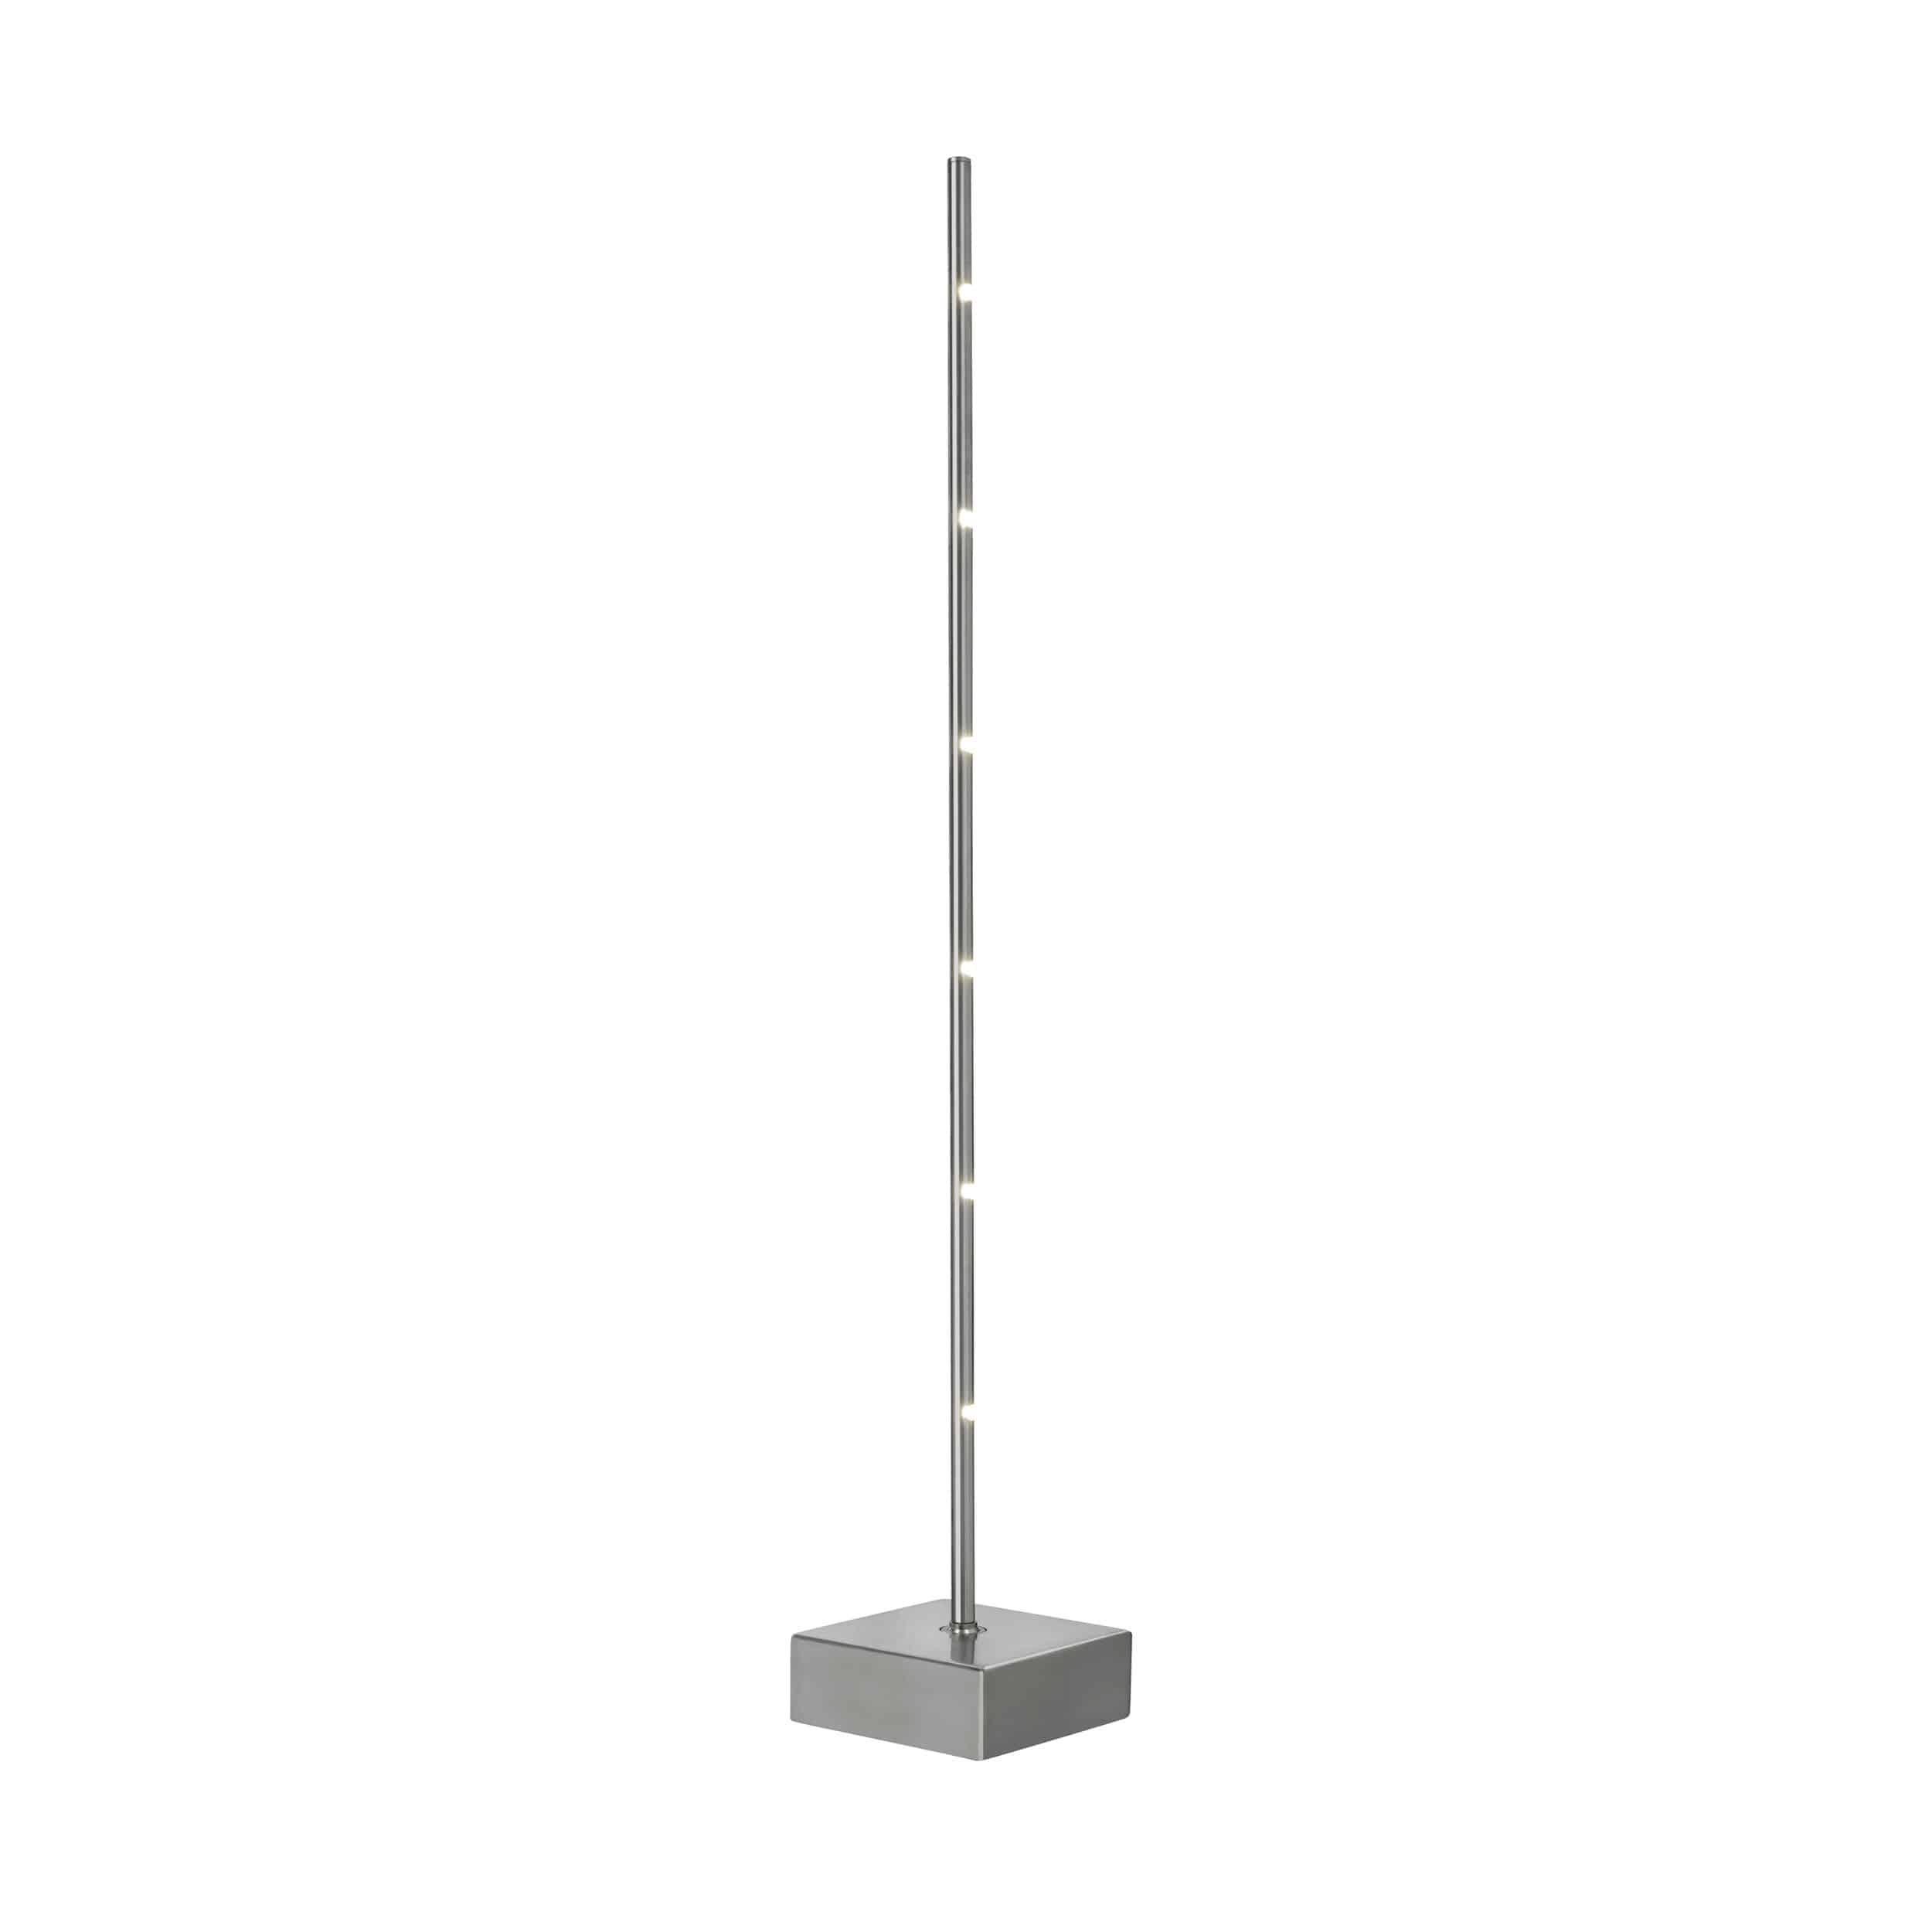 Pin LED Tischleuchte